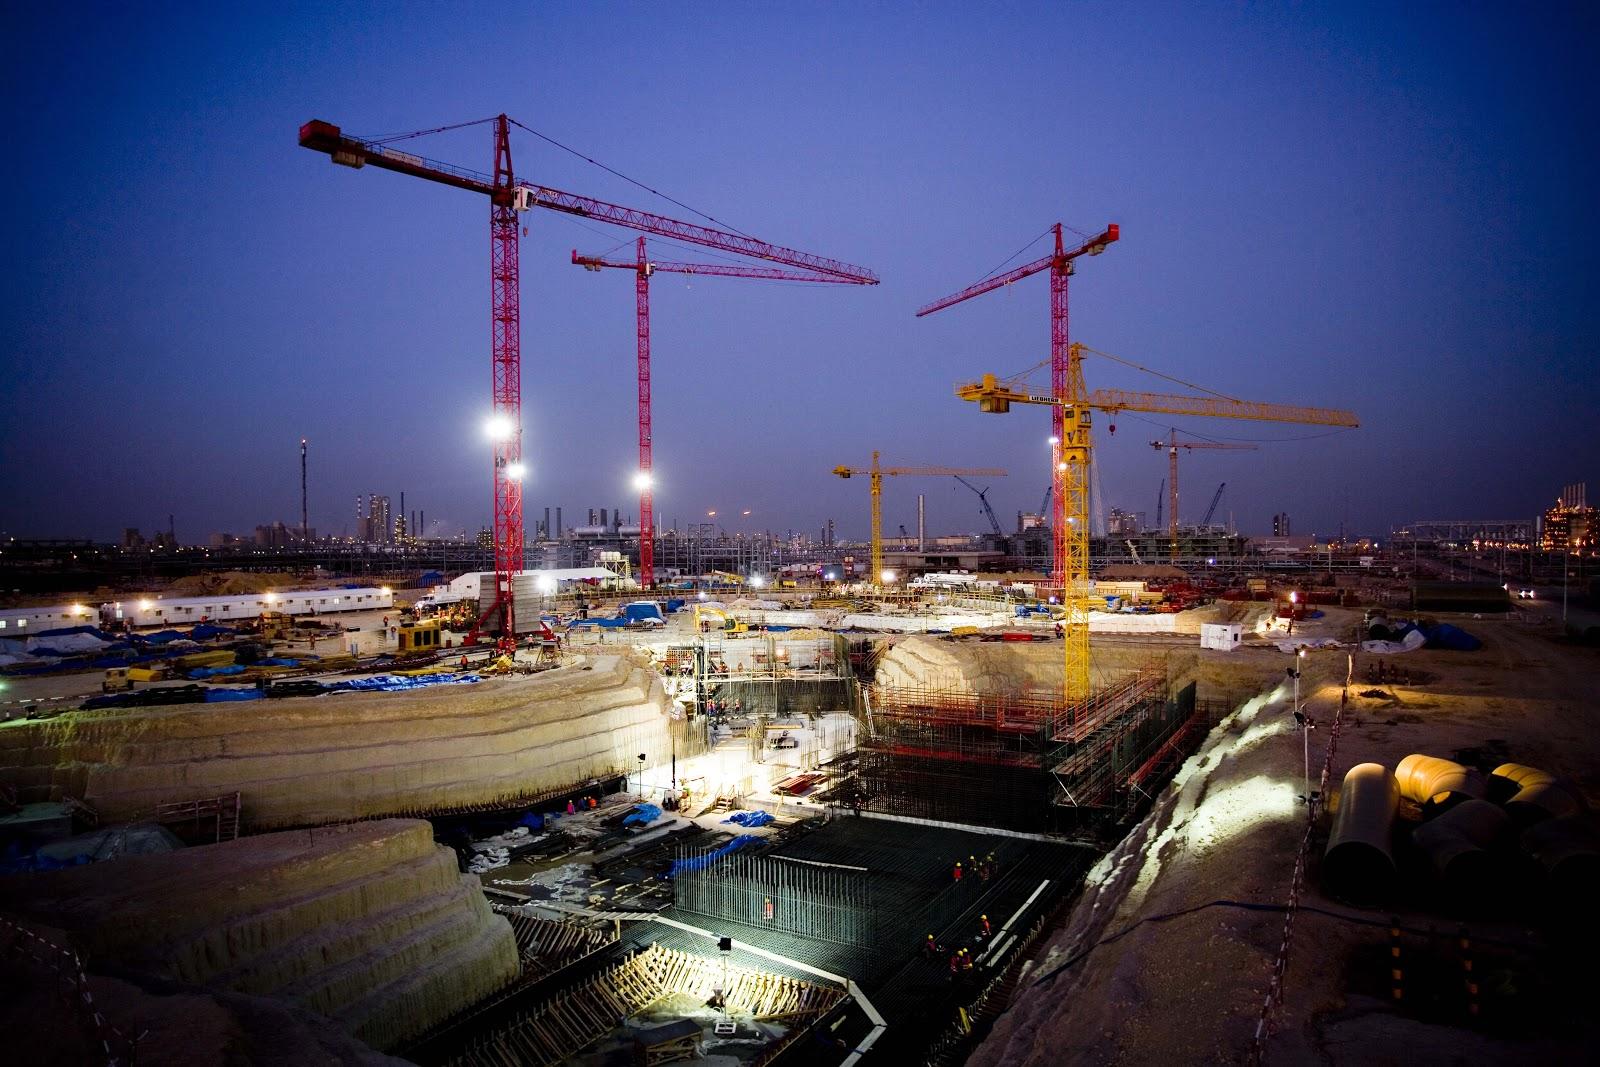 Fluor_construction_site_Shuaiba,_Kuwait.jpg